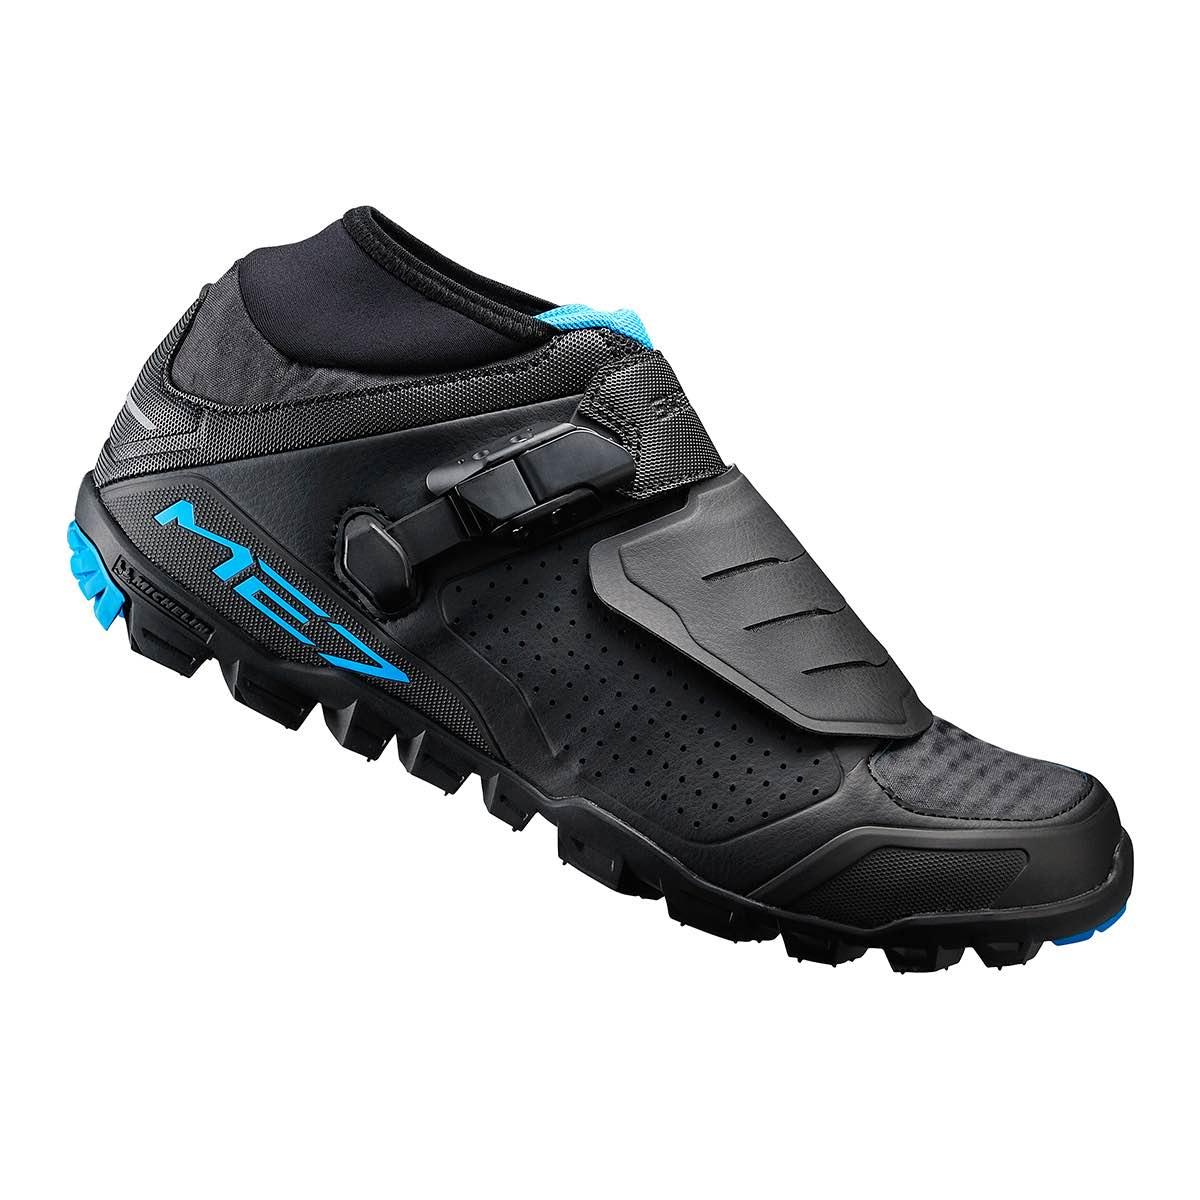 Shimano (ME7) MTB Shoe